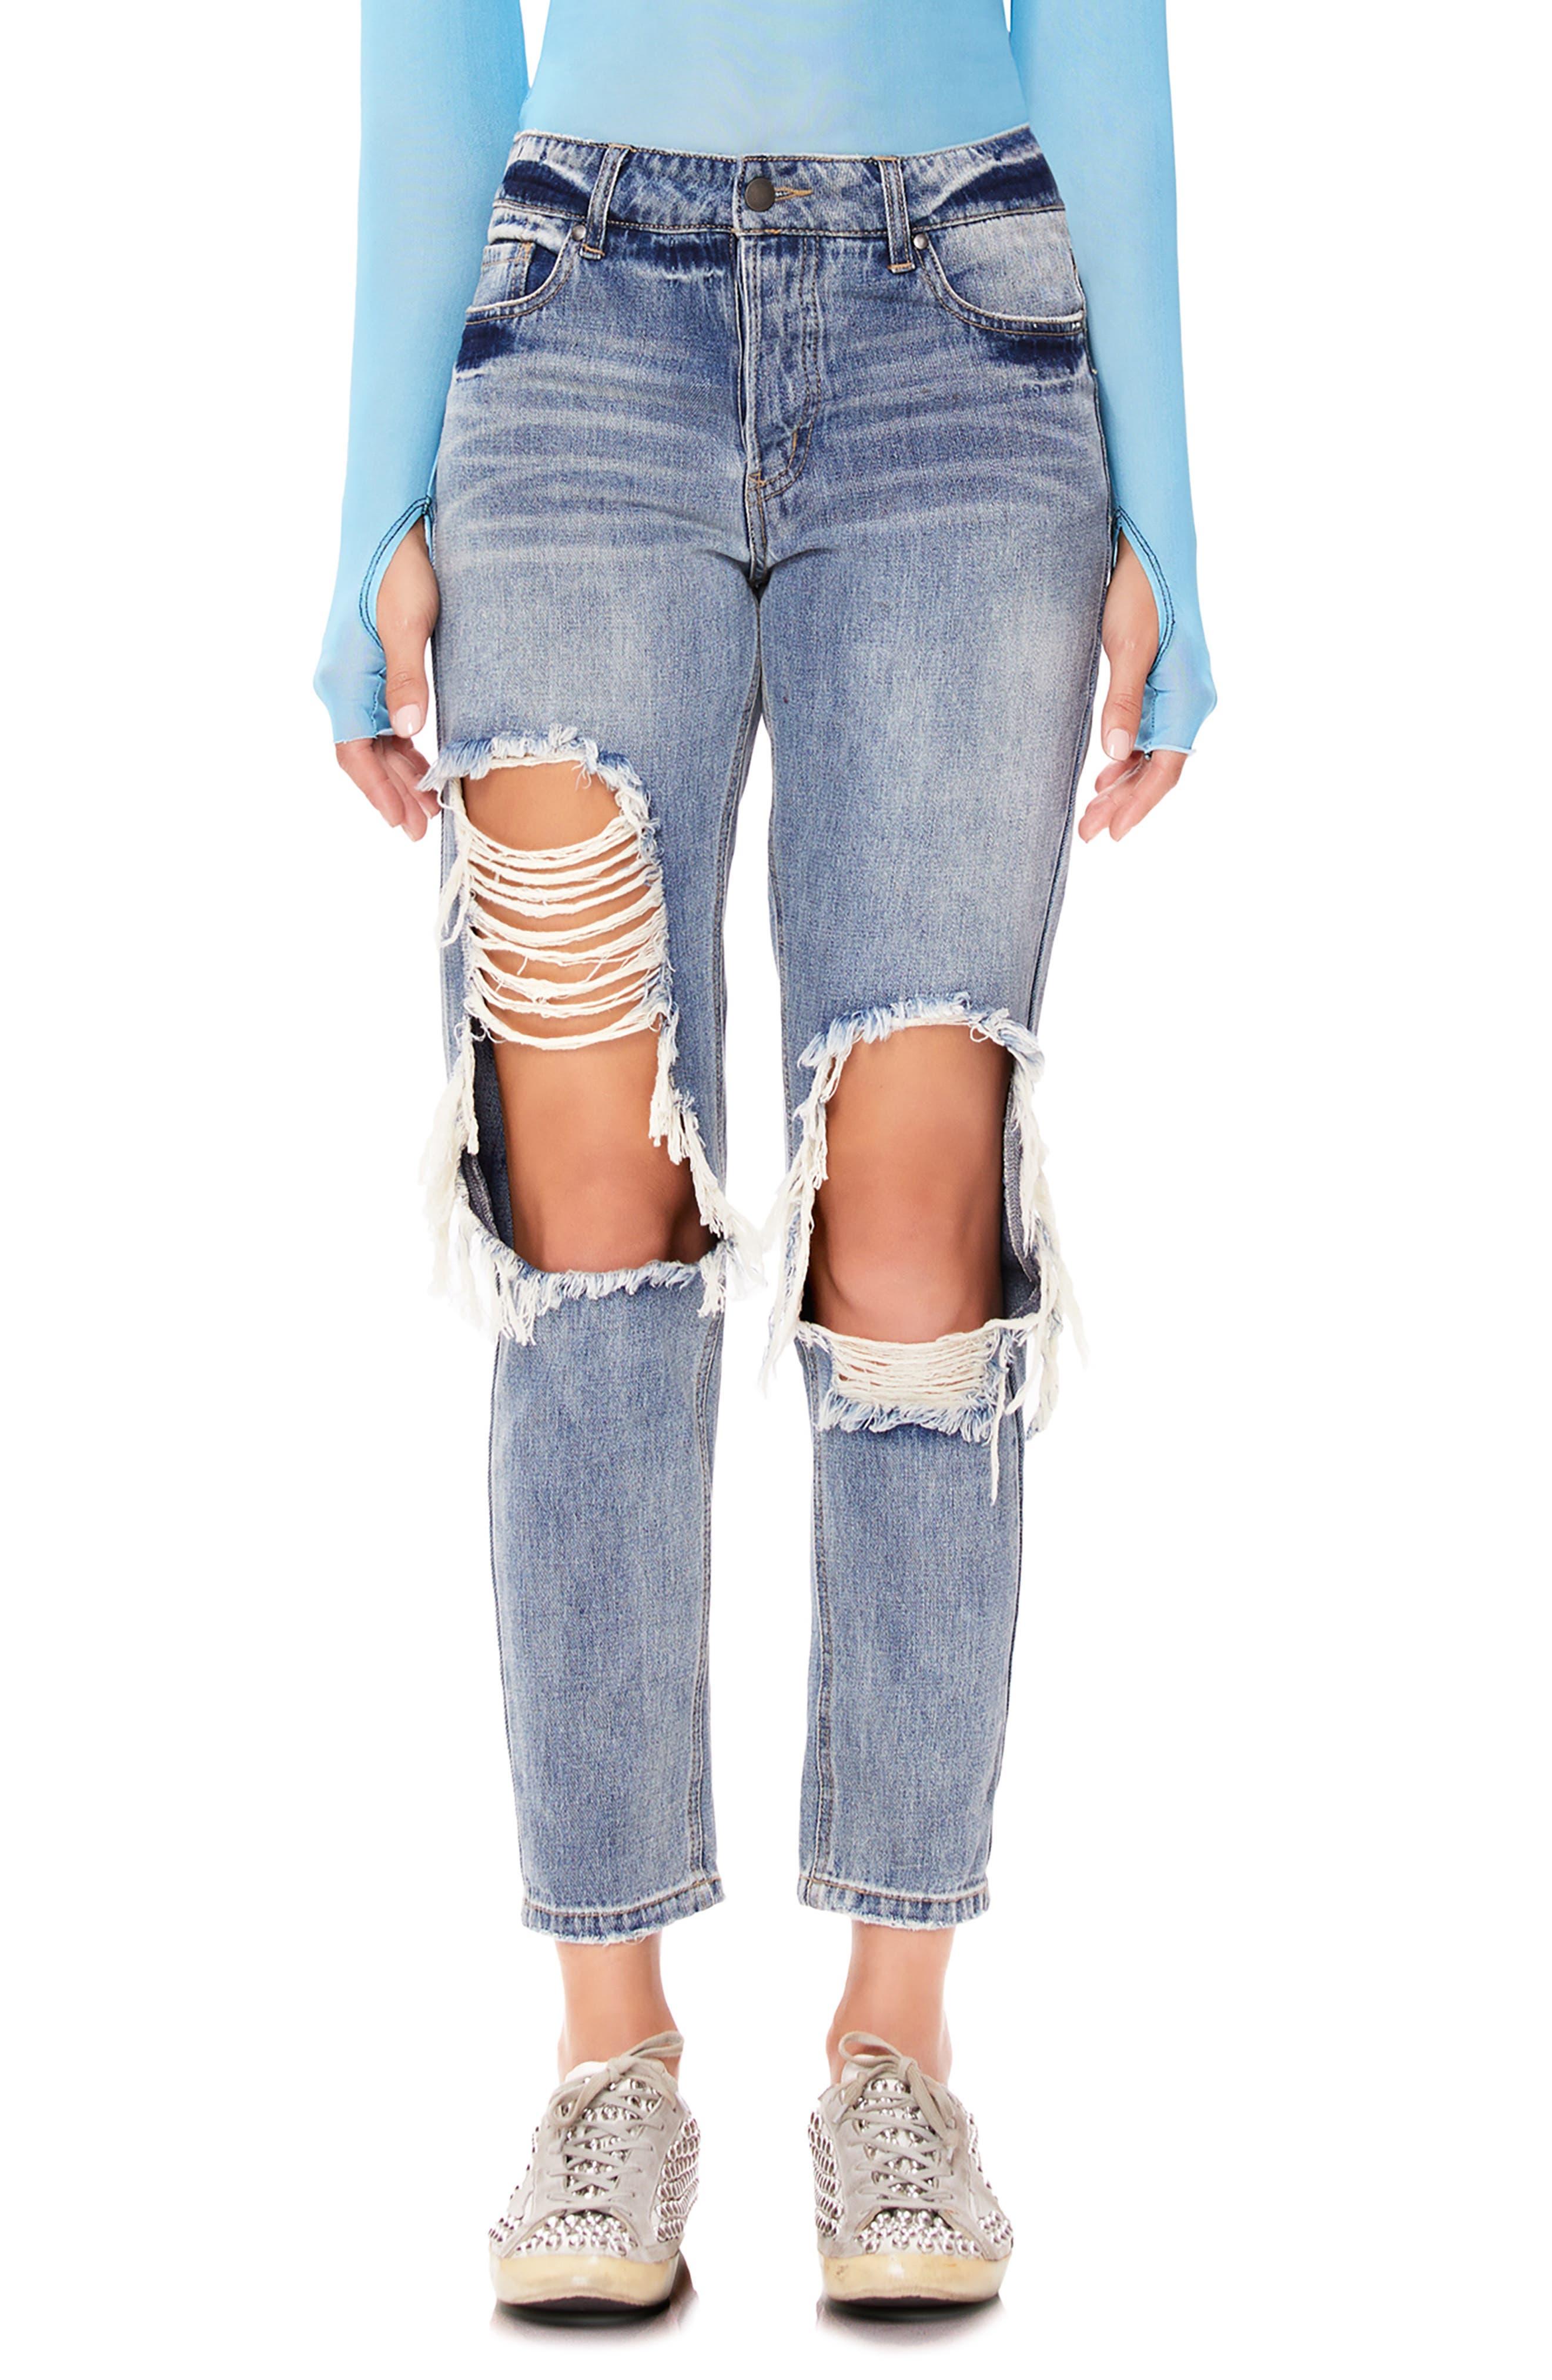 AFRM Cyrus High Waist Ankle Jeans (Sinner Wash)